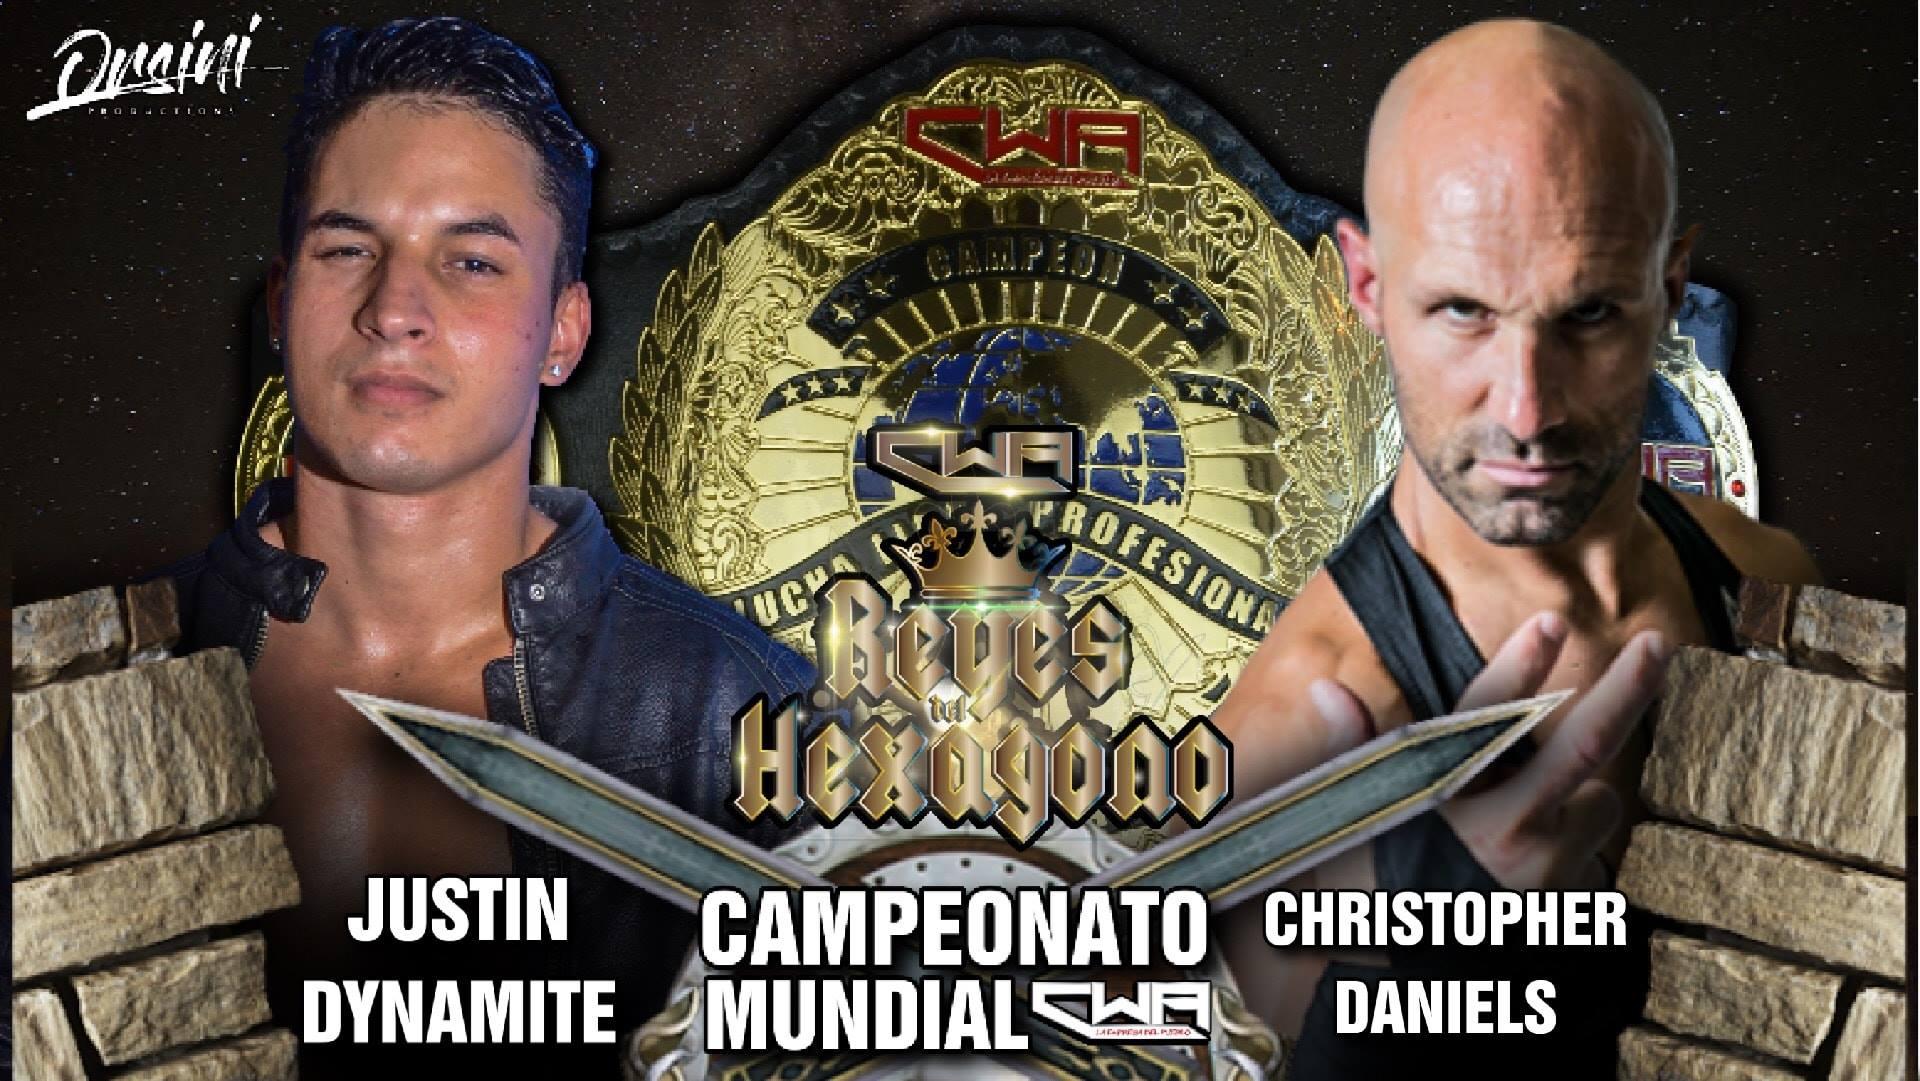 VIDEO: HIGHLIGHTS Justin Dynamite vs Christopher Daniels por el Campeonato Mundial de la CWA 1